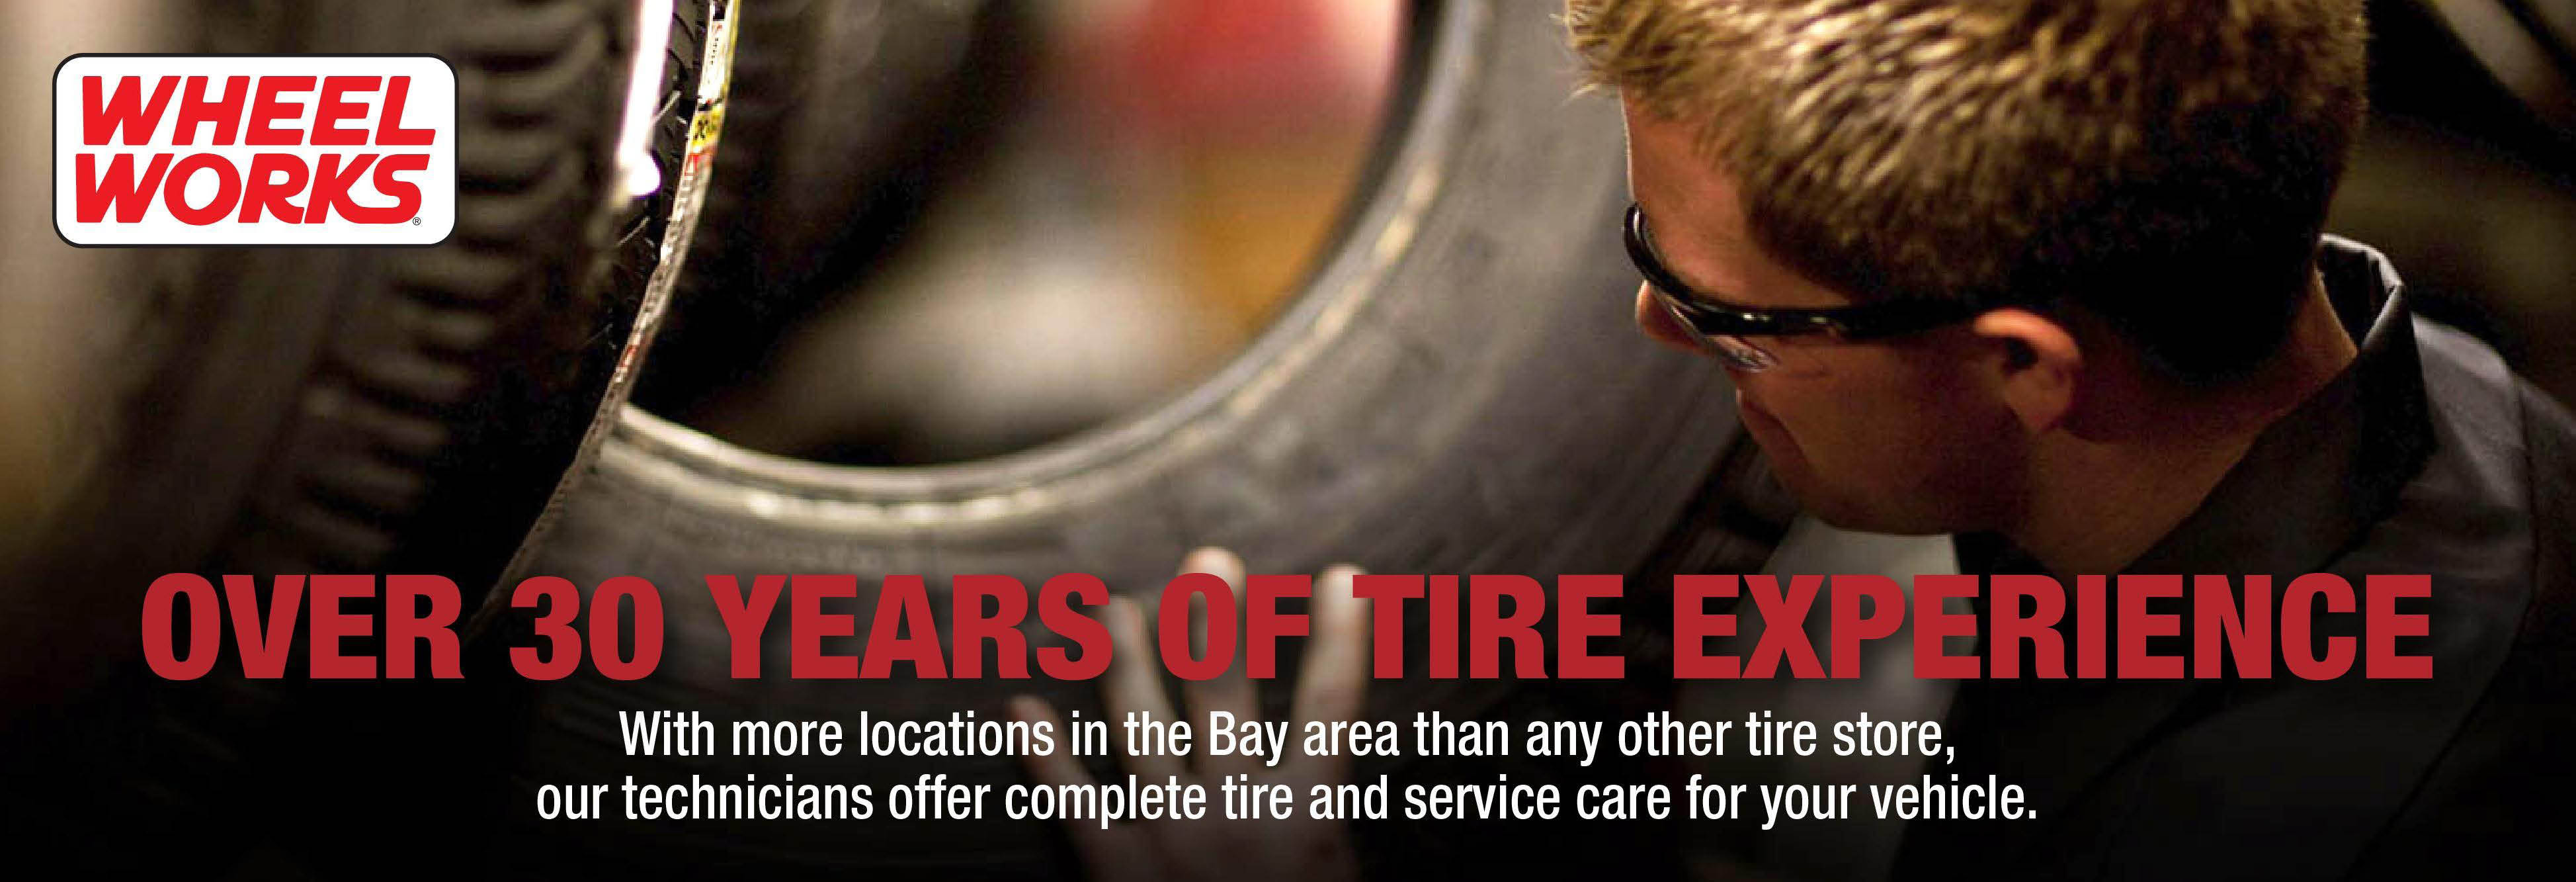 Tire coupons near me Firestone tire coupon save on Firestone tires San Ramon